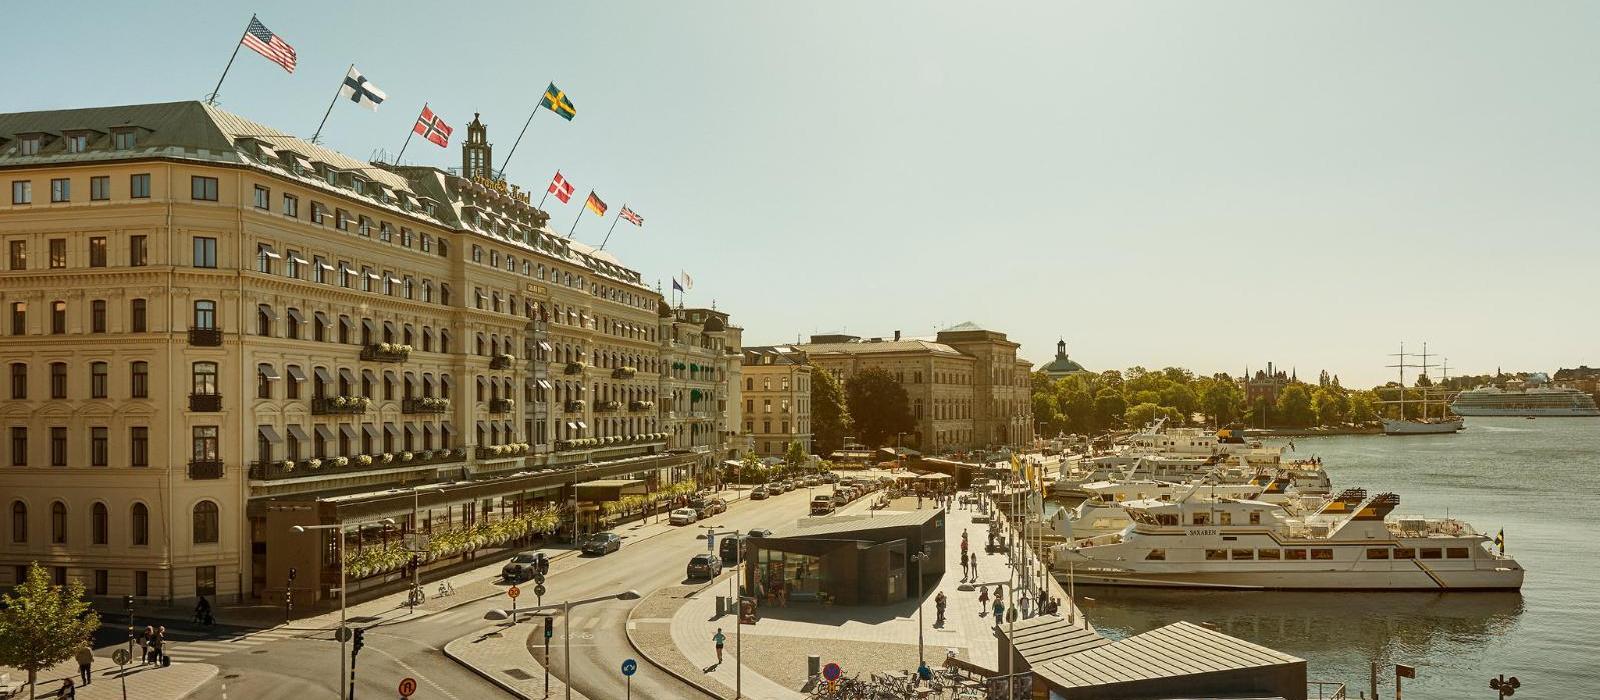 斯德哥尔摩大酒店(Grand Hotel Stockholm) 图片  www.lhw.cn